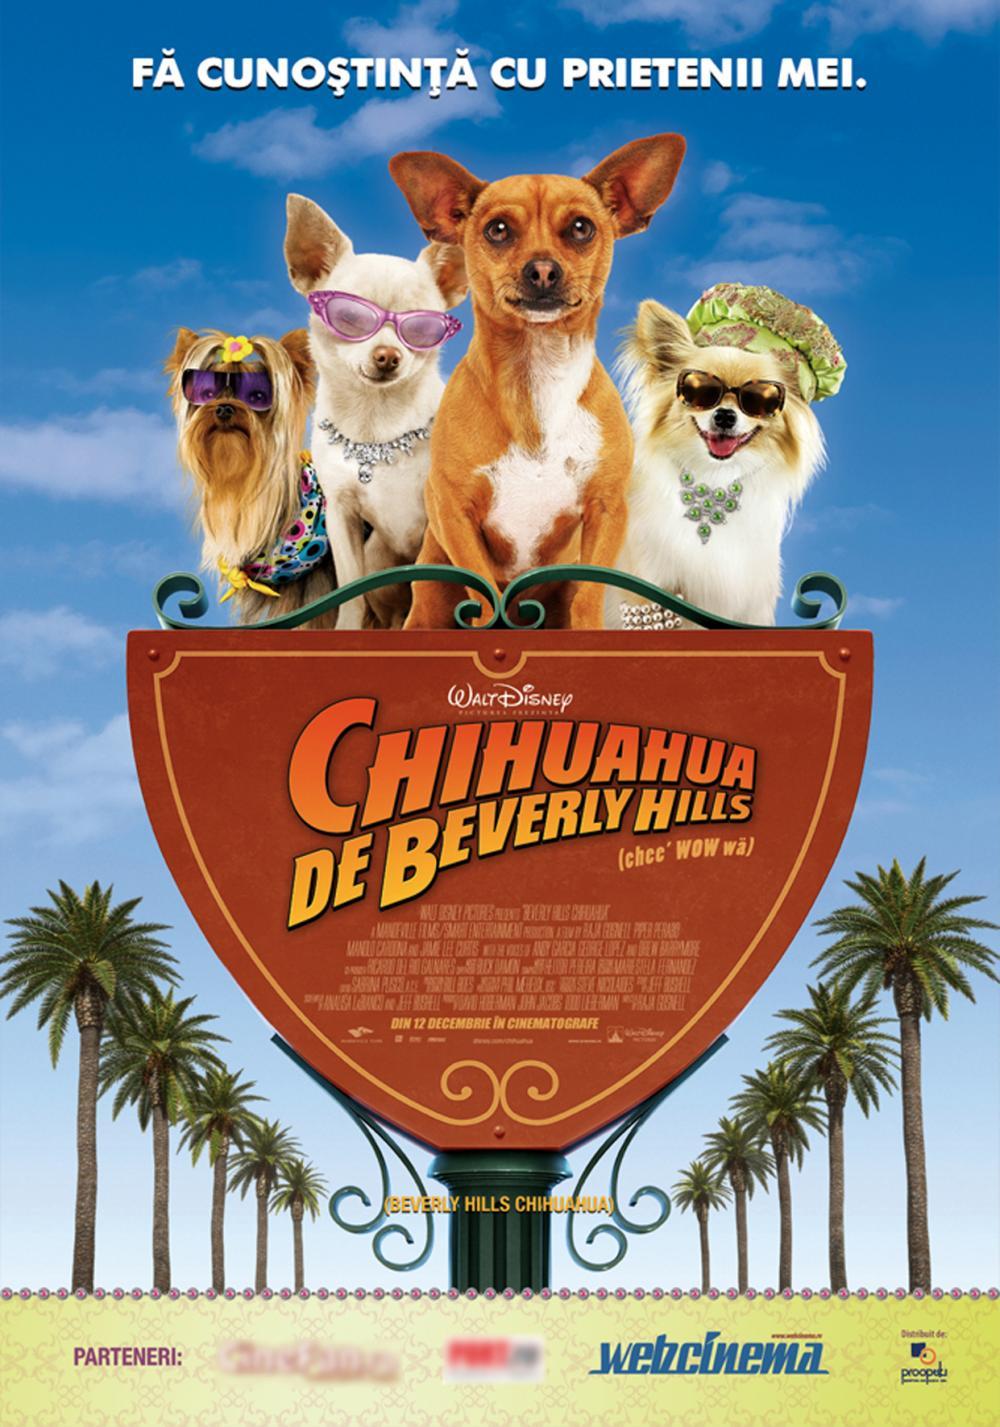 CHIHUAHUA DE BEVERLY HI BEVERLY HILLS CHIHUAHUA